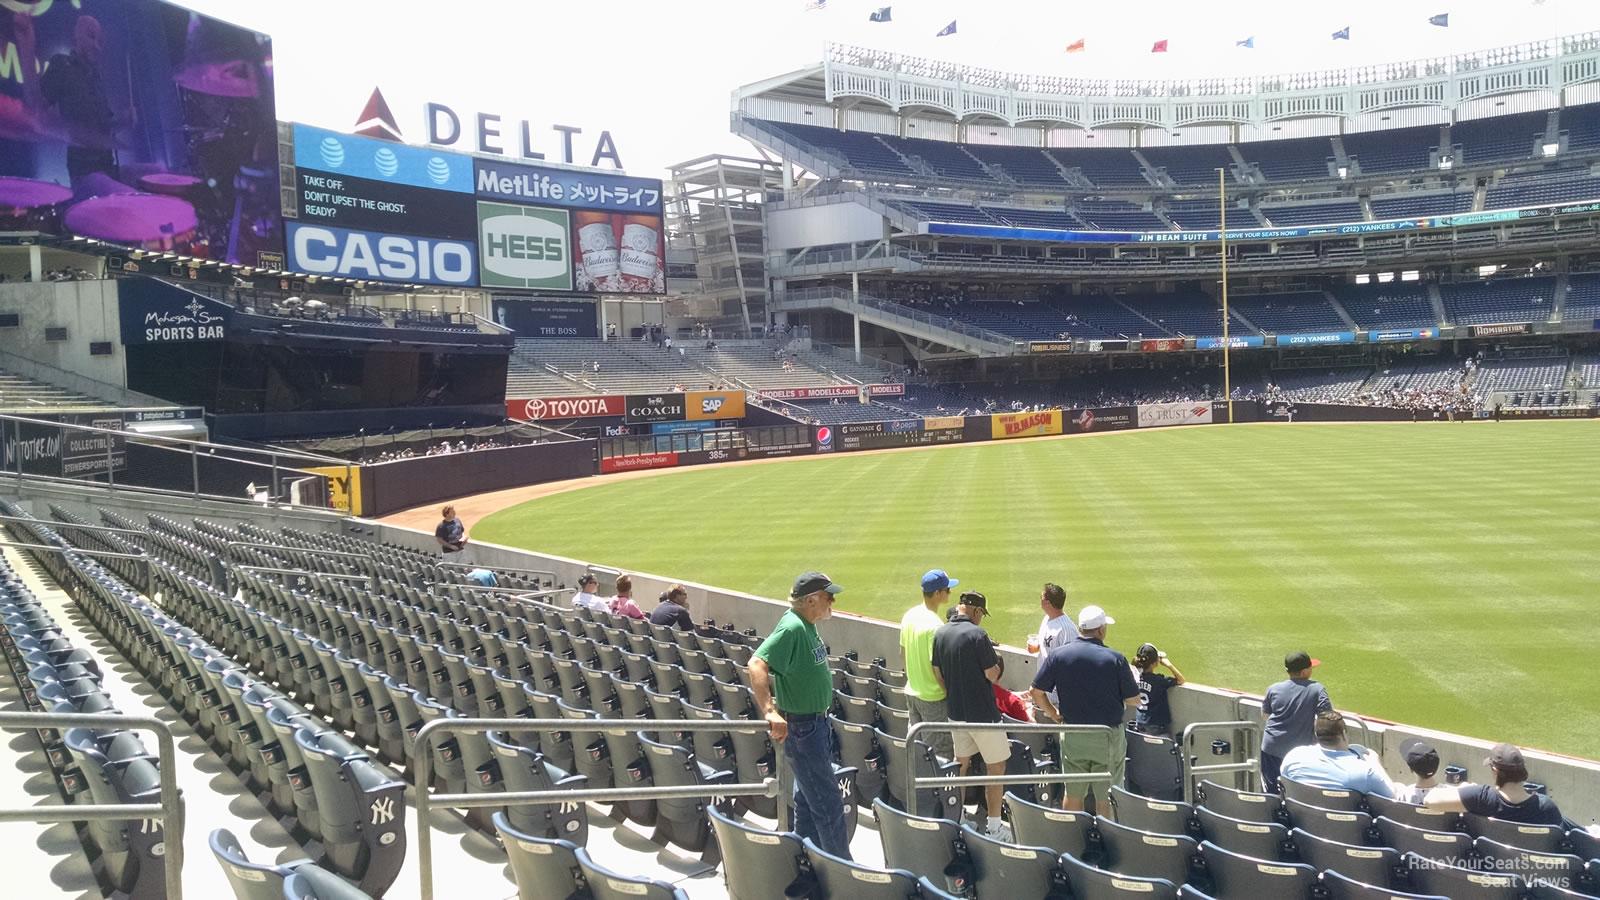 Yankee Stadium Section 134 - New York Yankees - RateYourSeats.com